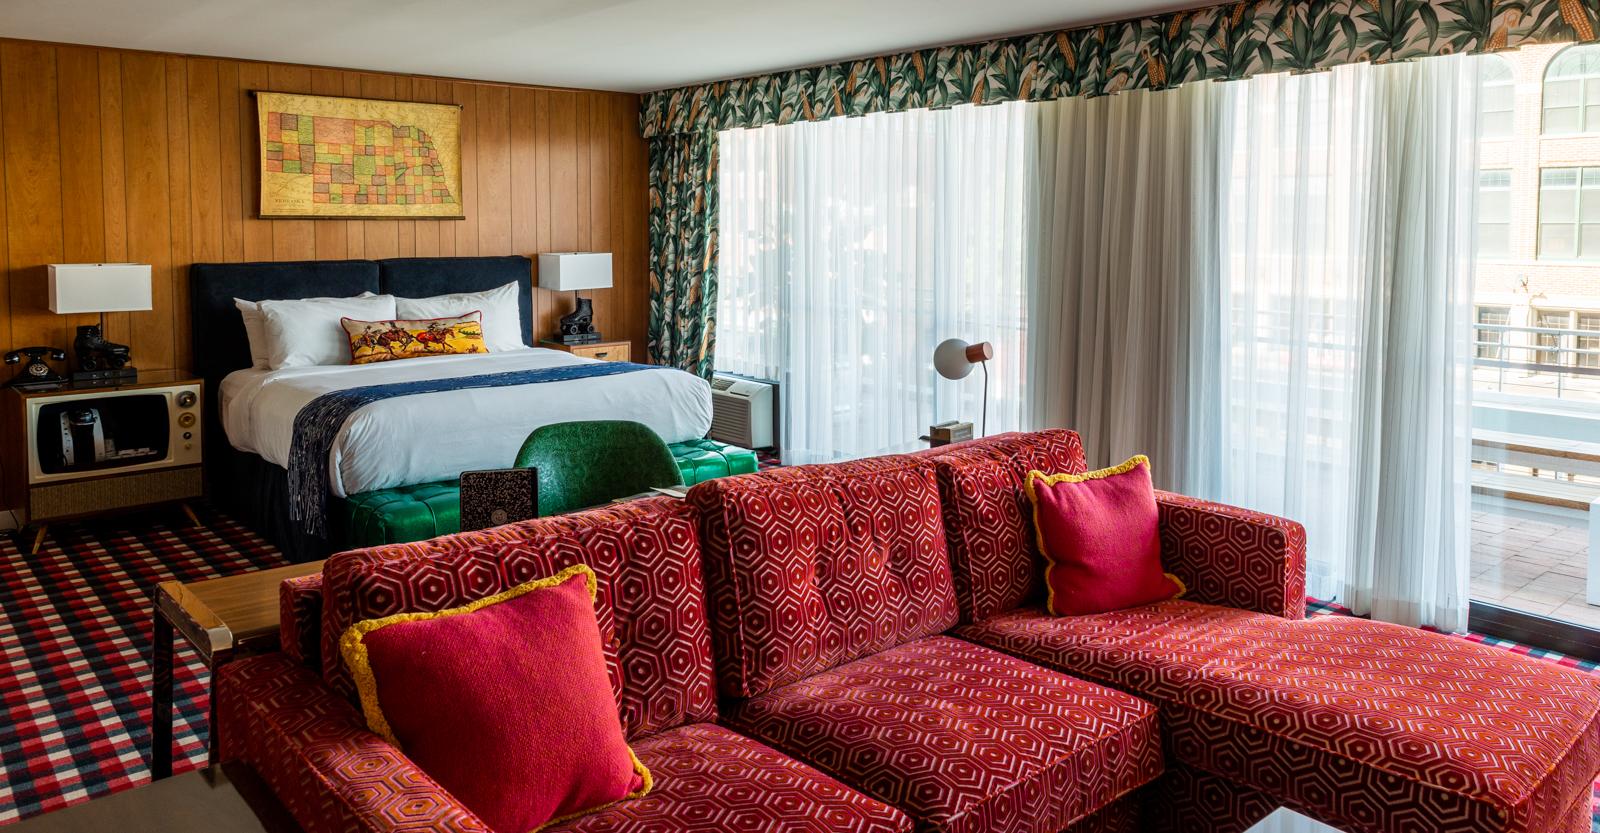 Graduate Lincoln Hotel for The New York Times, Lincoln, Nebraska, 2018